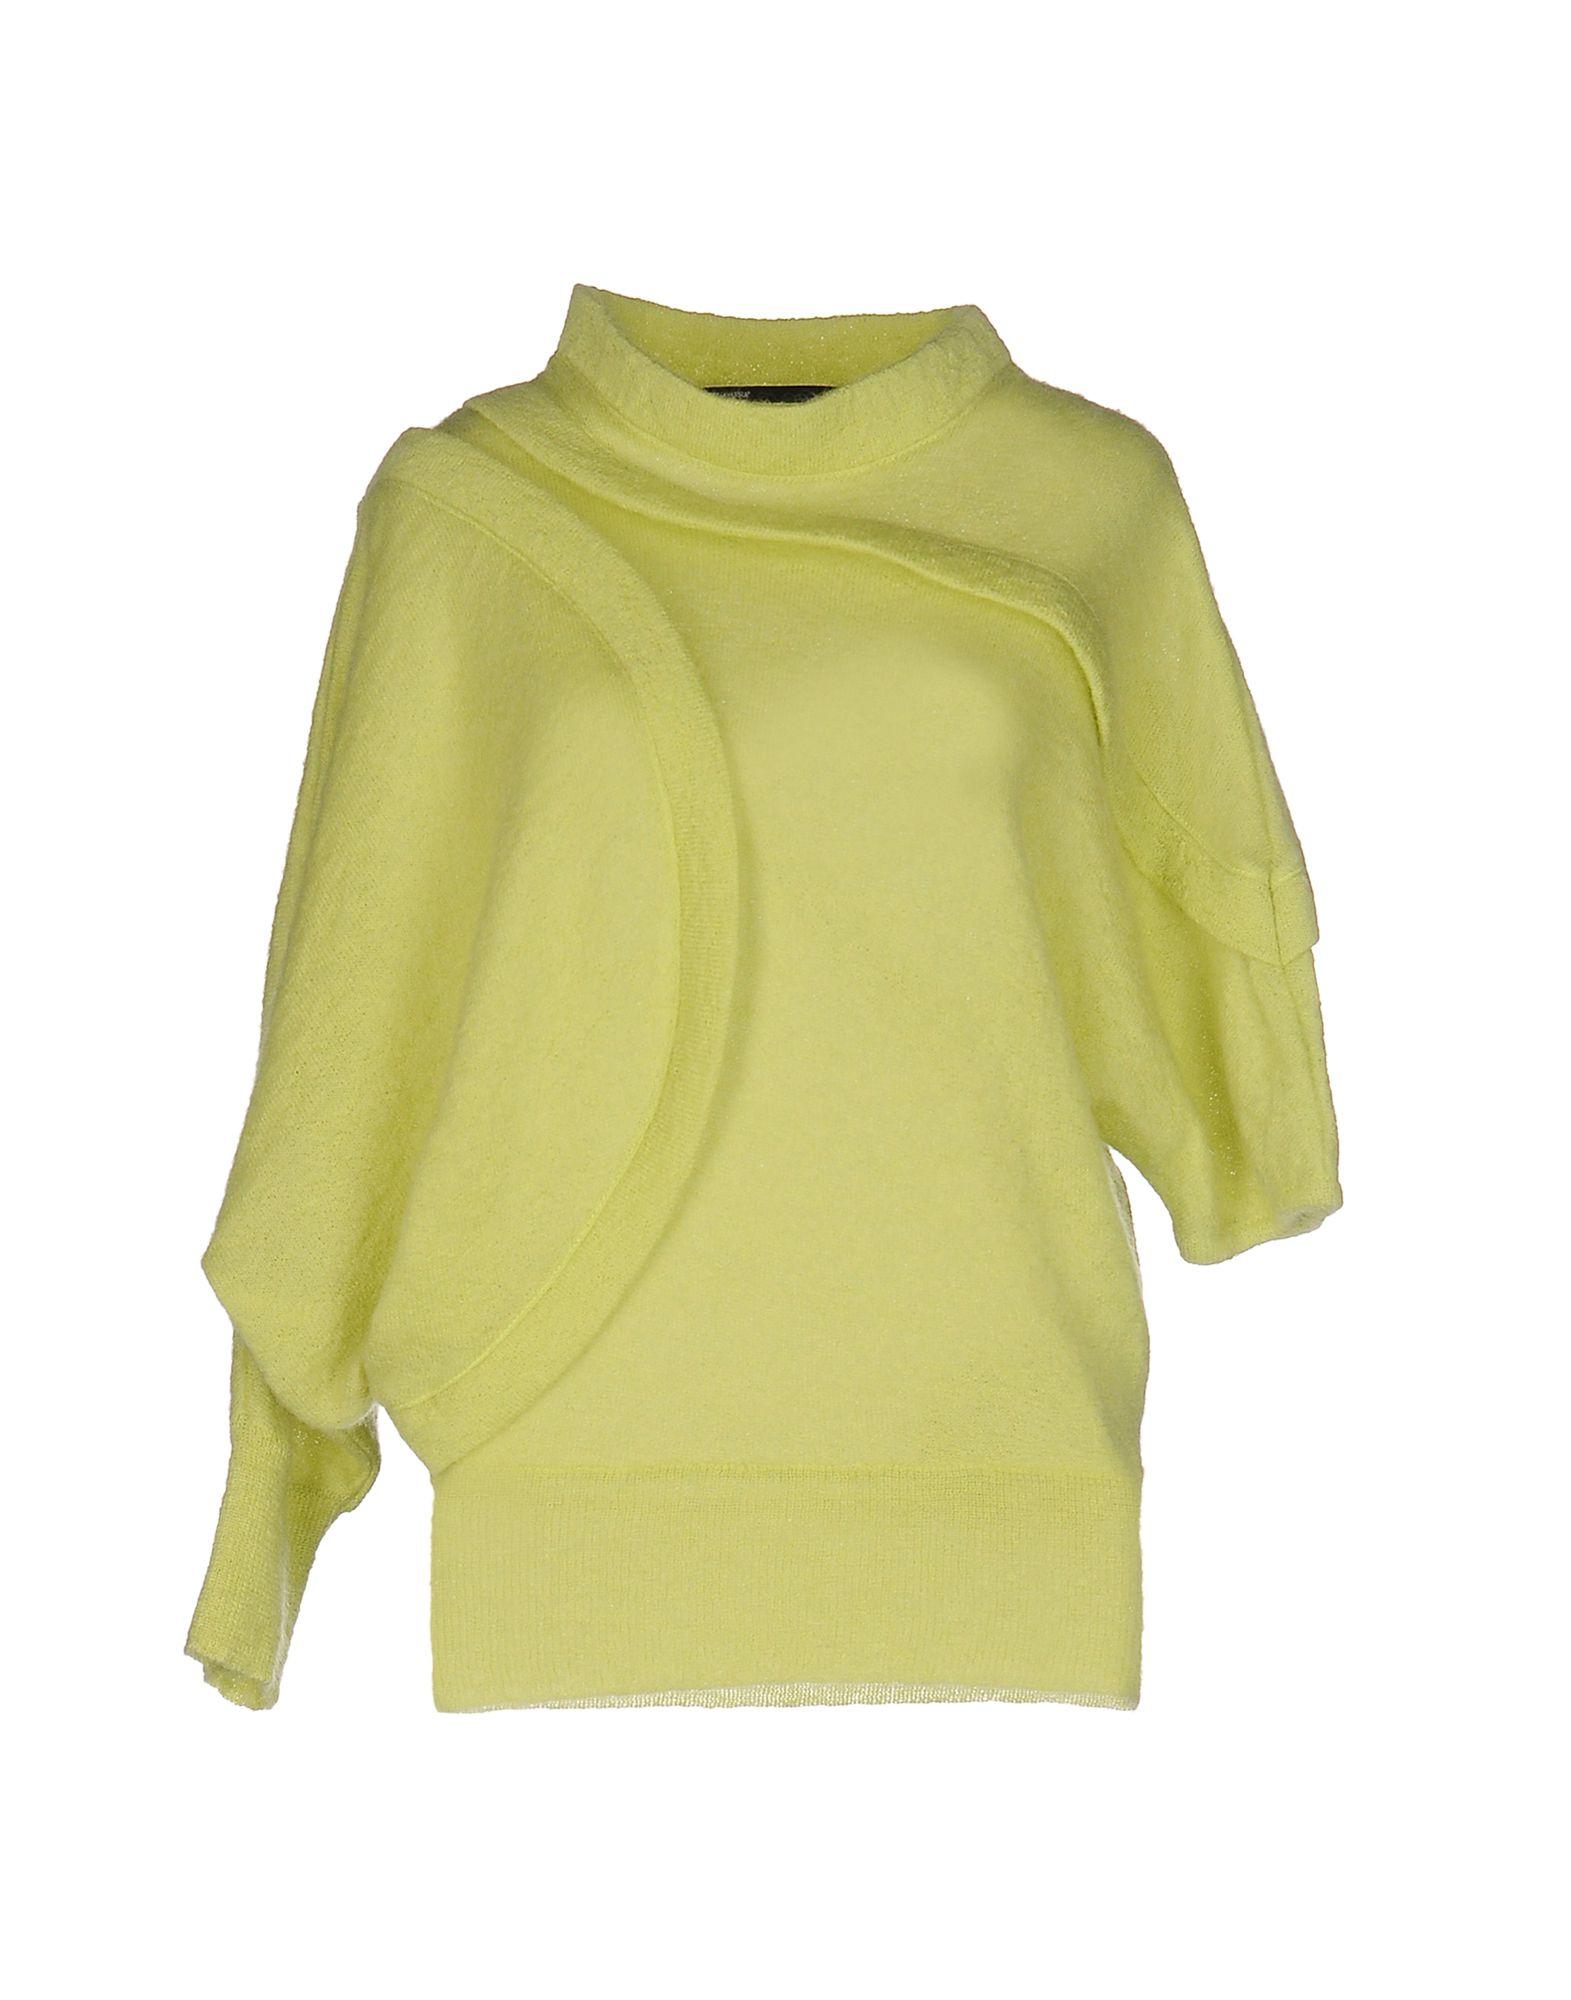 GAETANO NAVARRA Sweaters